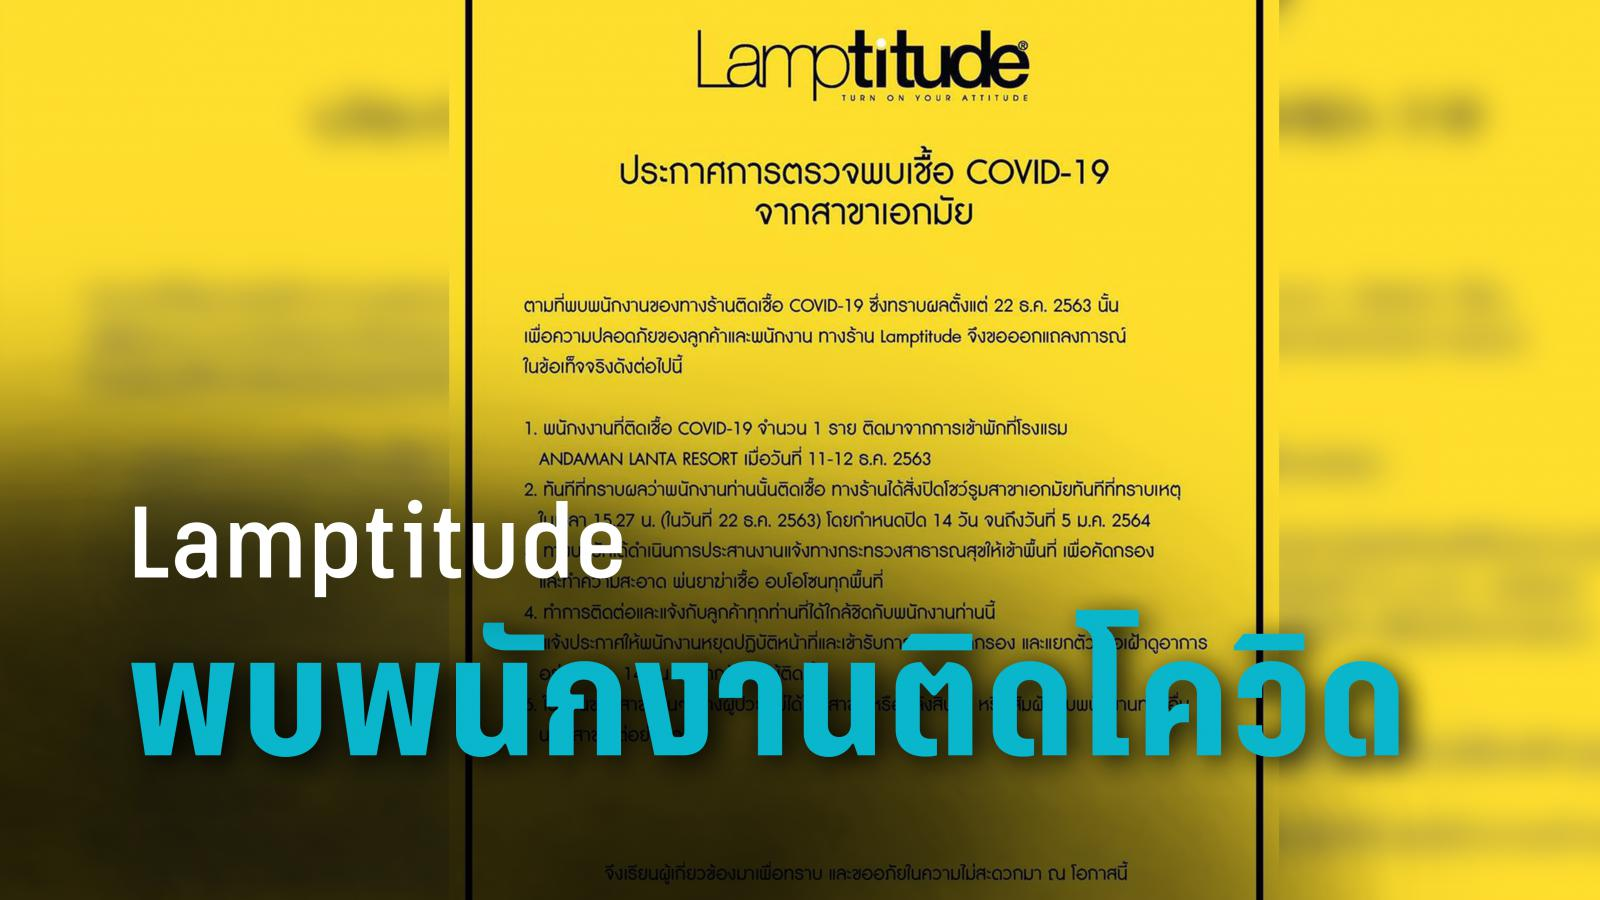 Lamptitude  เอกมัย พบพนักงานติดโควิด 1 ราย